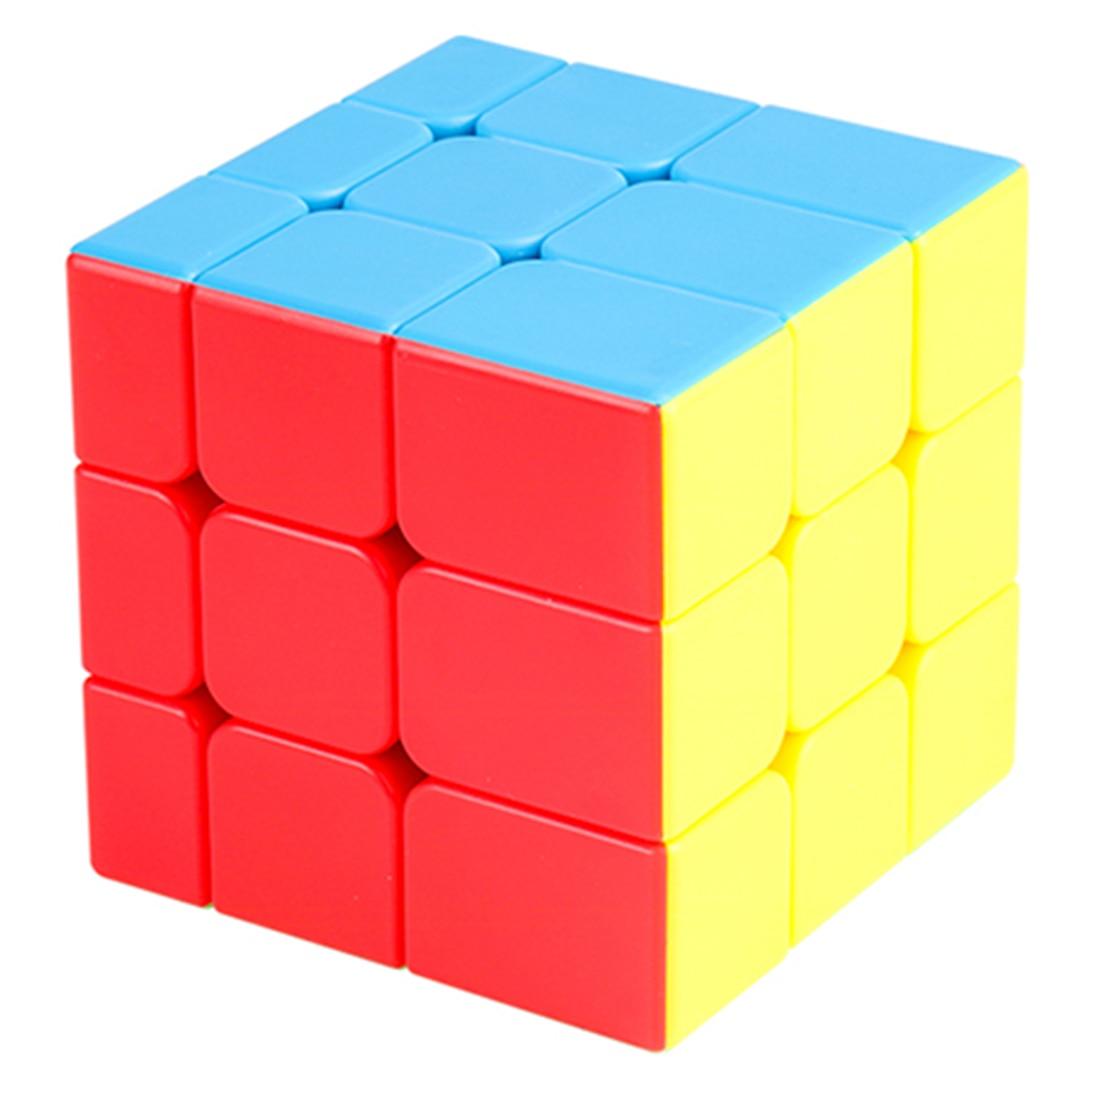 Moyu Cubing Classroom  Mofang Jiaoshi Inequilateral Magic Cube Educational Toys For Brain Trainning Colorful Stickerless